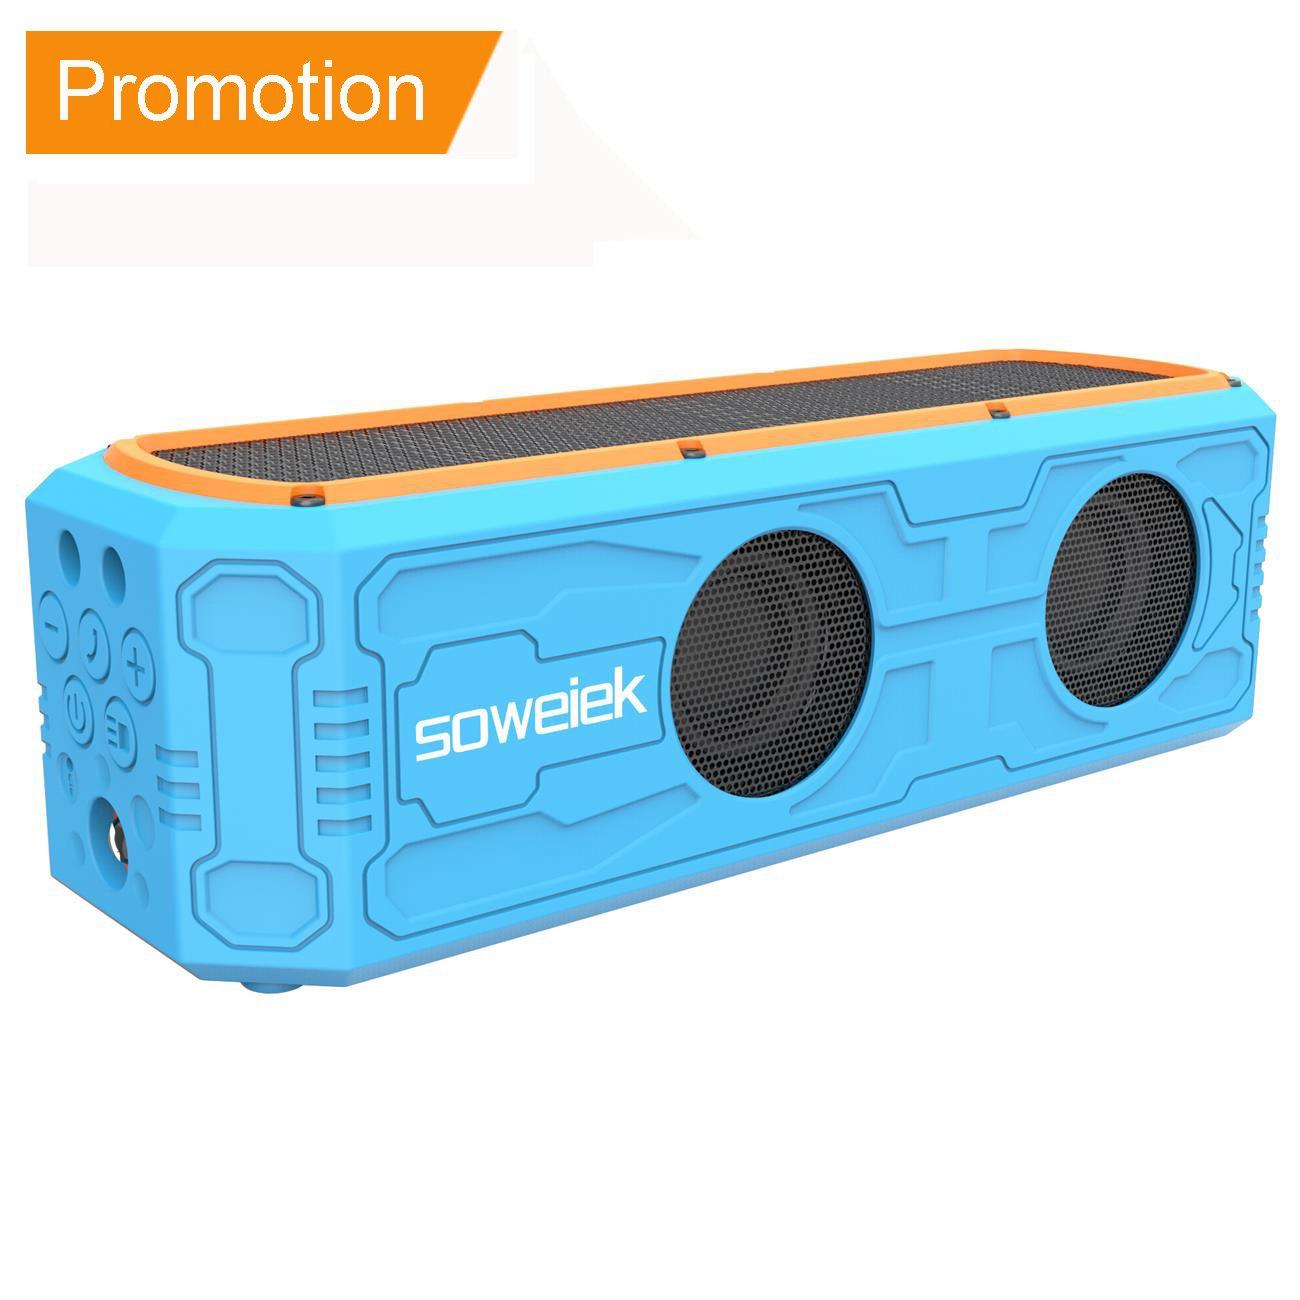 Solar-Powered Bluetooth Speaker, Soweiek Portable Wireless Speakers with 55 Hours Playtime HD Stereo Bass 4400mAh Power Bank Mic AUX IPX5 Waterproof Durable Design - Blue by Soweiek